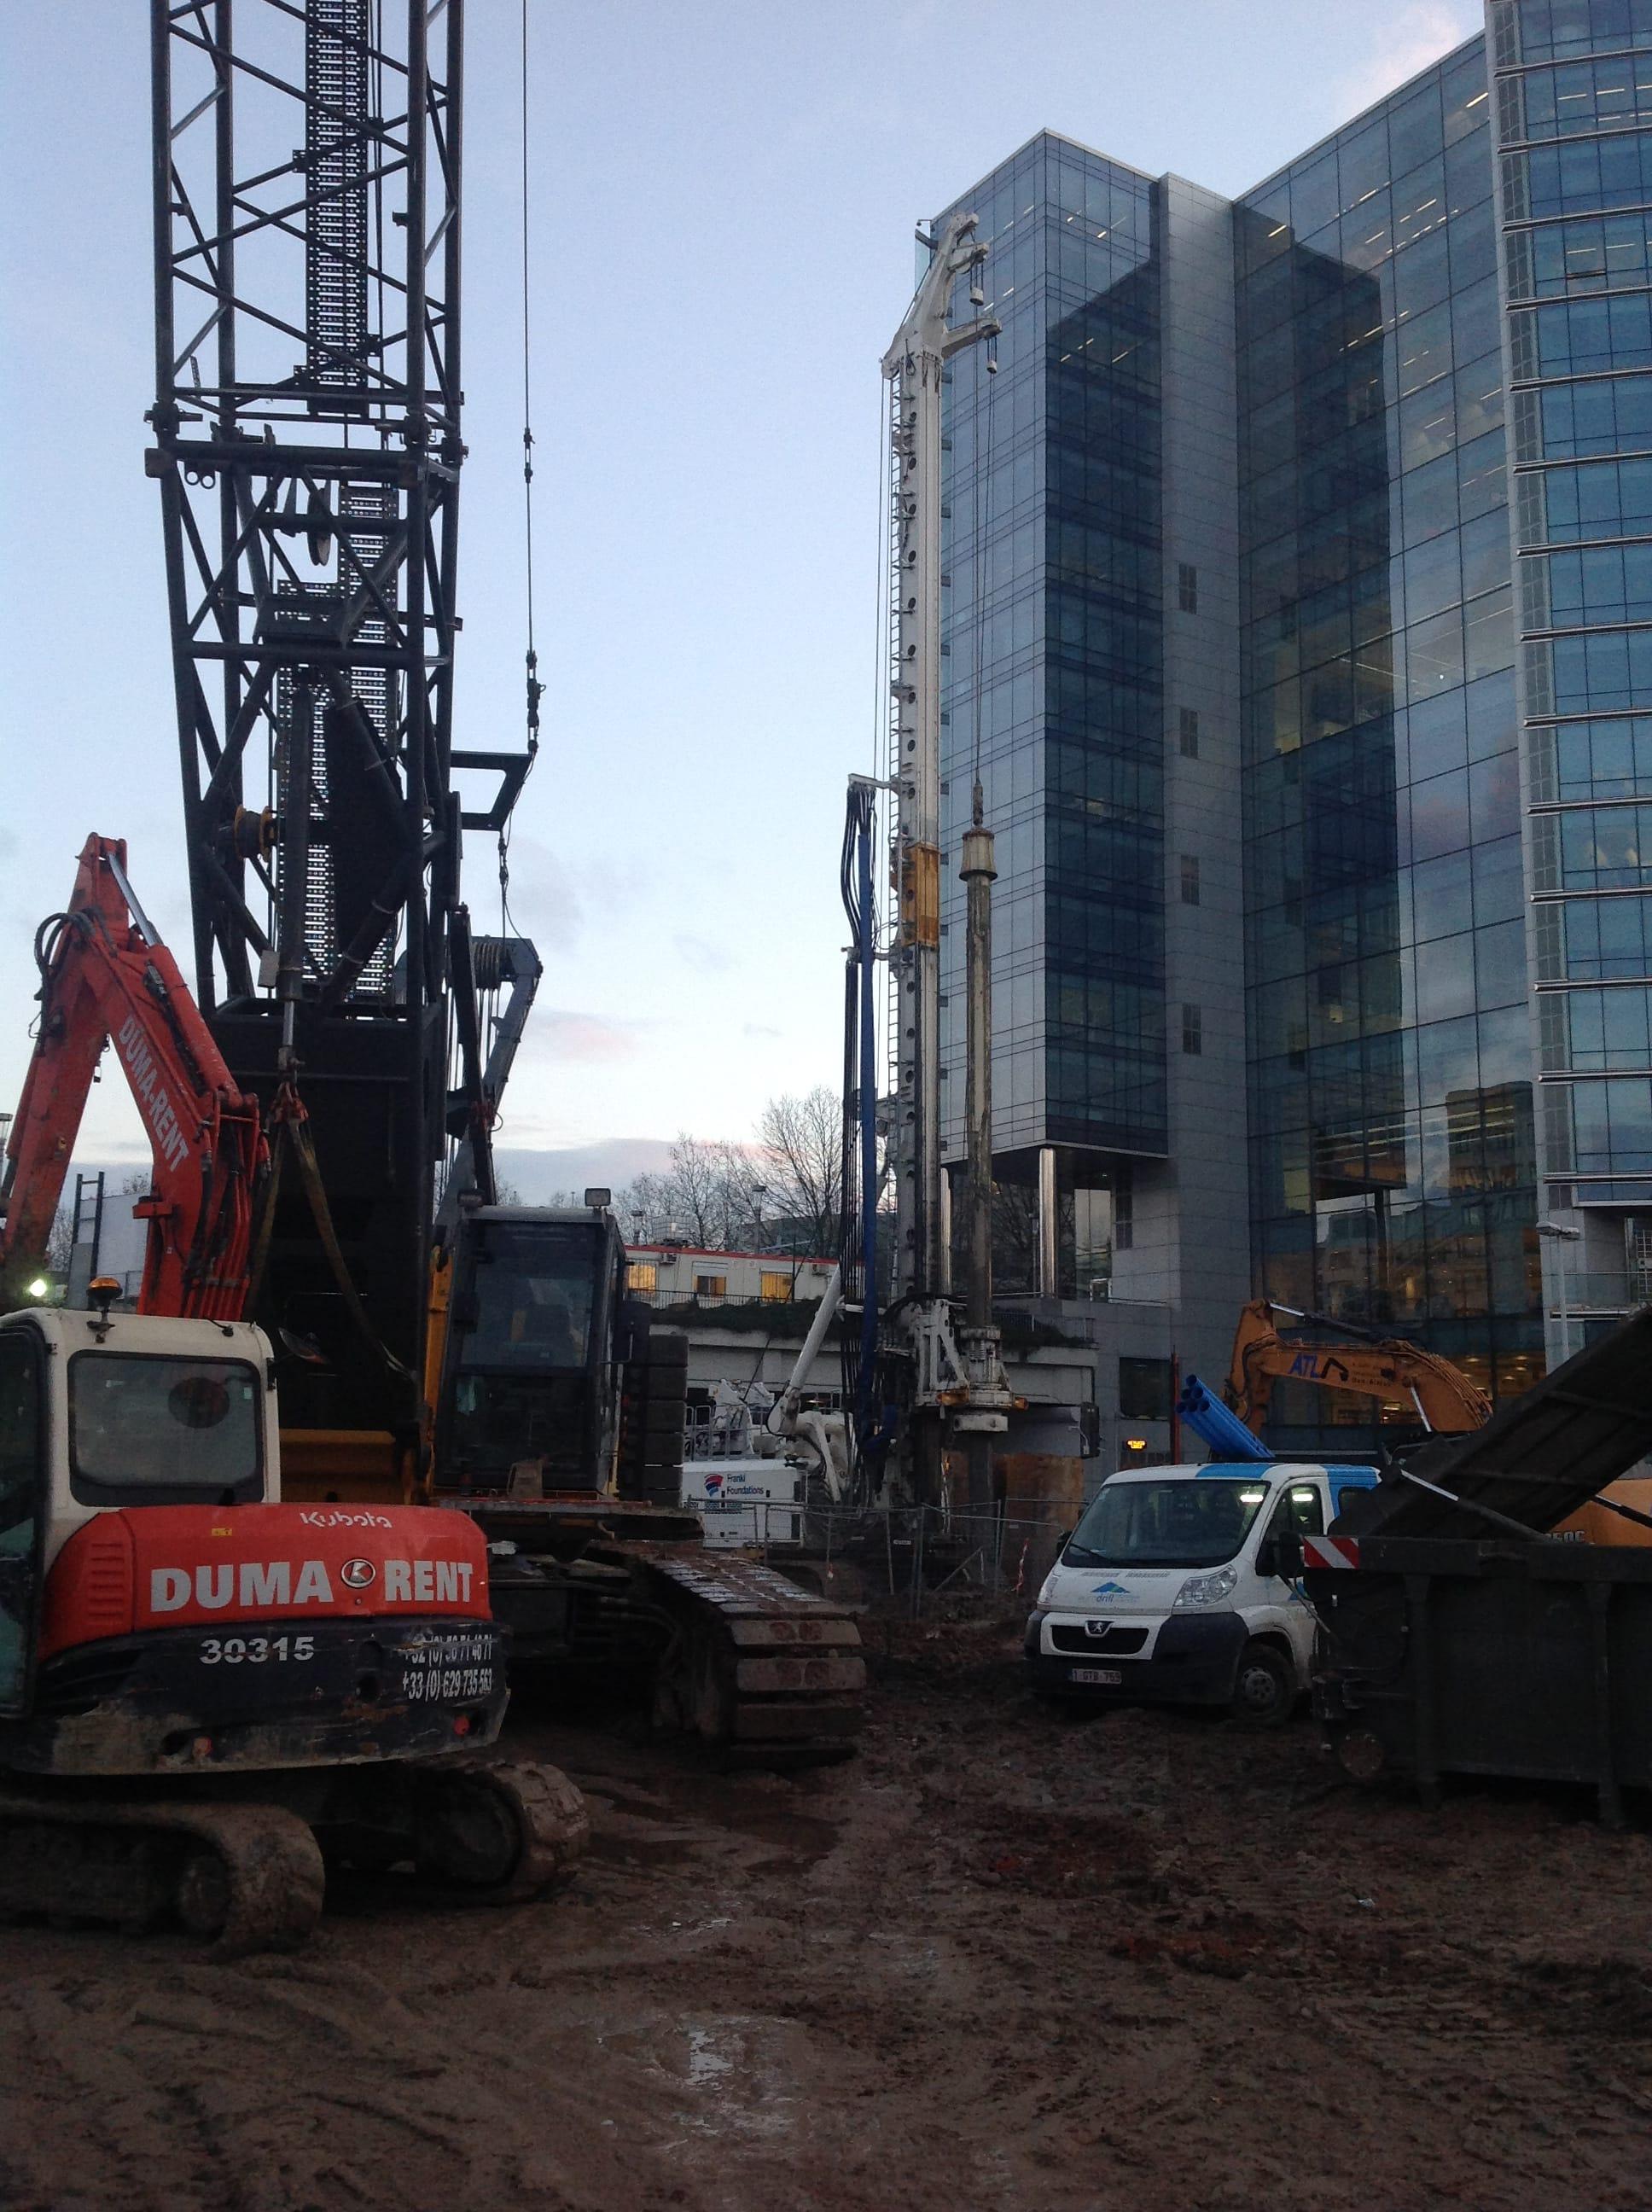 chantier-bruxelles-forage-installation-pompe-puits-geothermie-eurodrill-liege-belgique-3